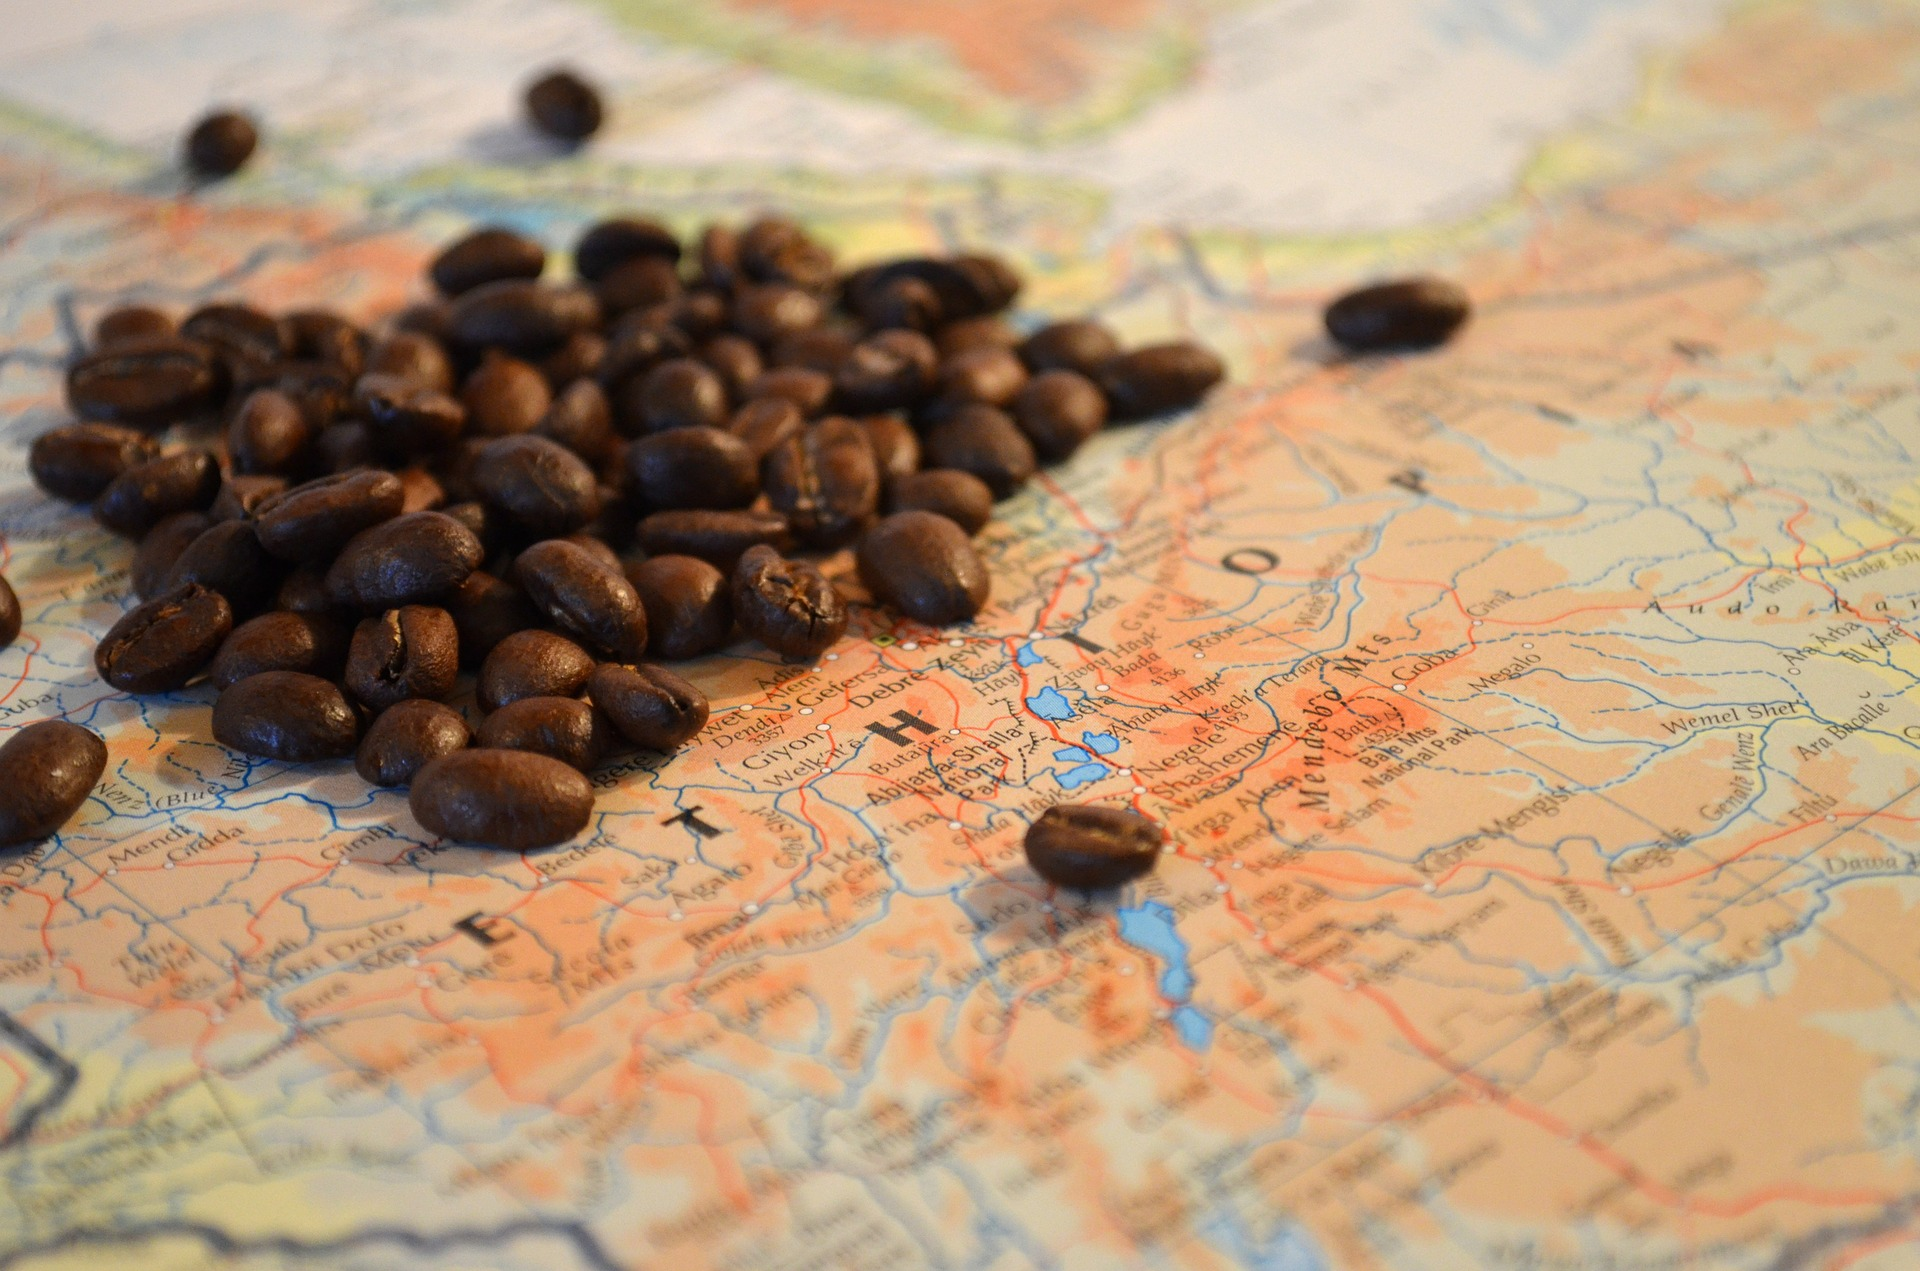 Coffee Capital of the World by John Iglar